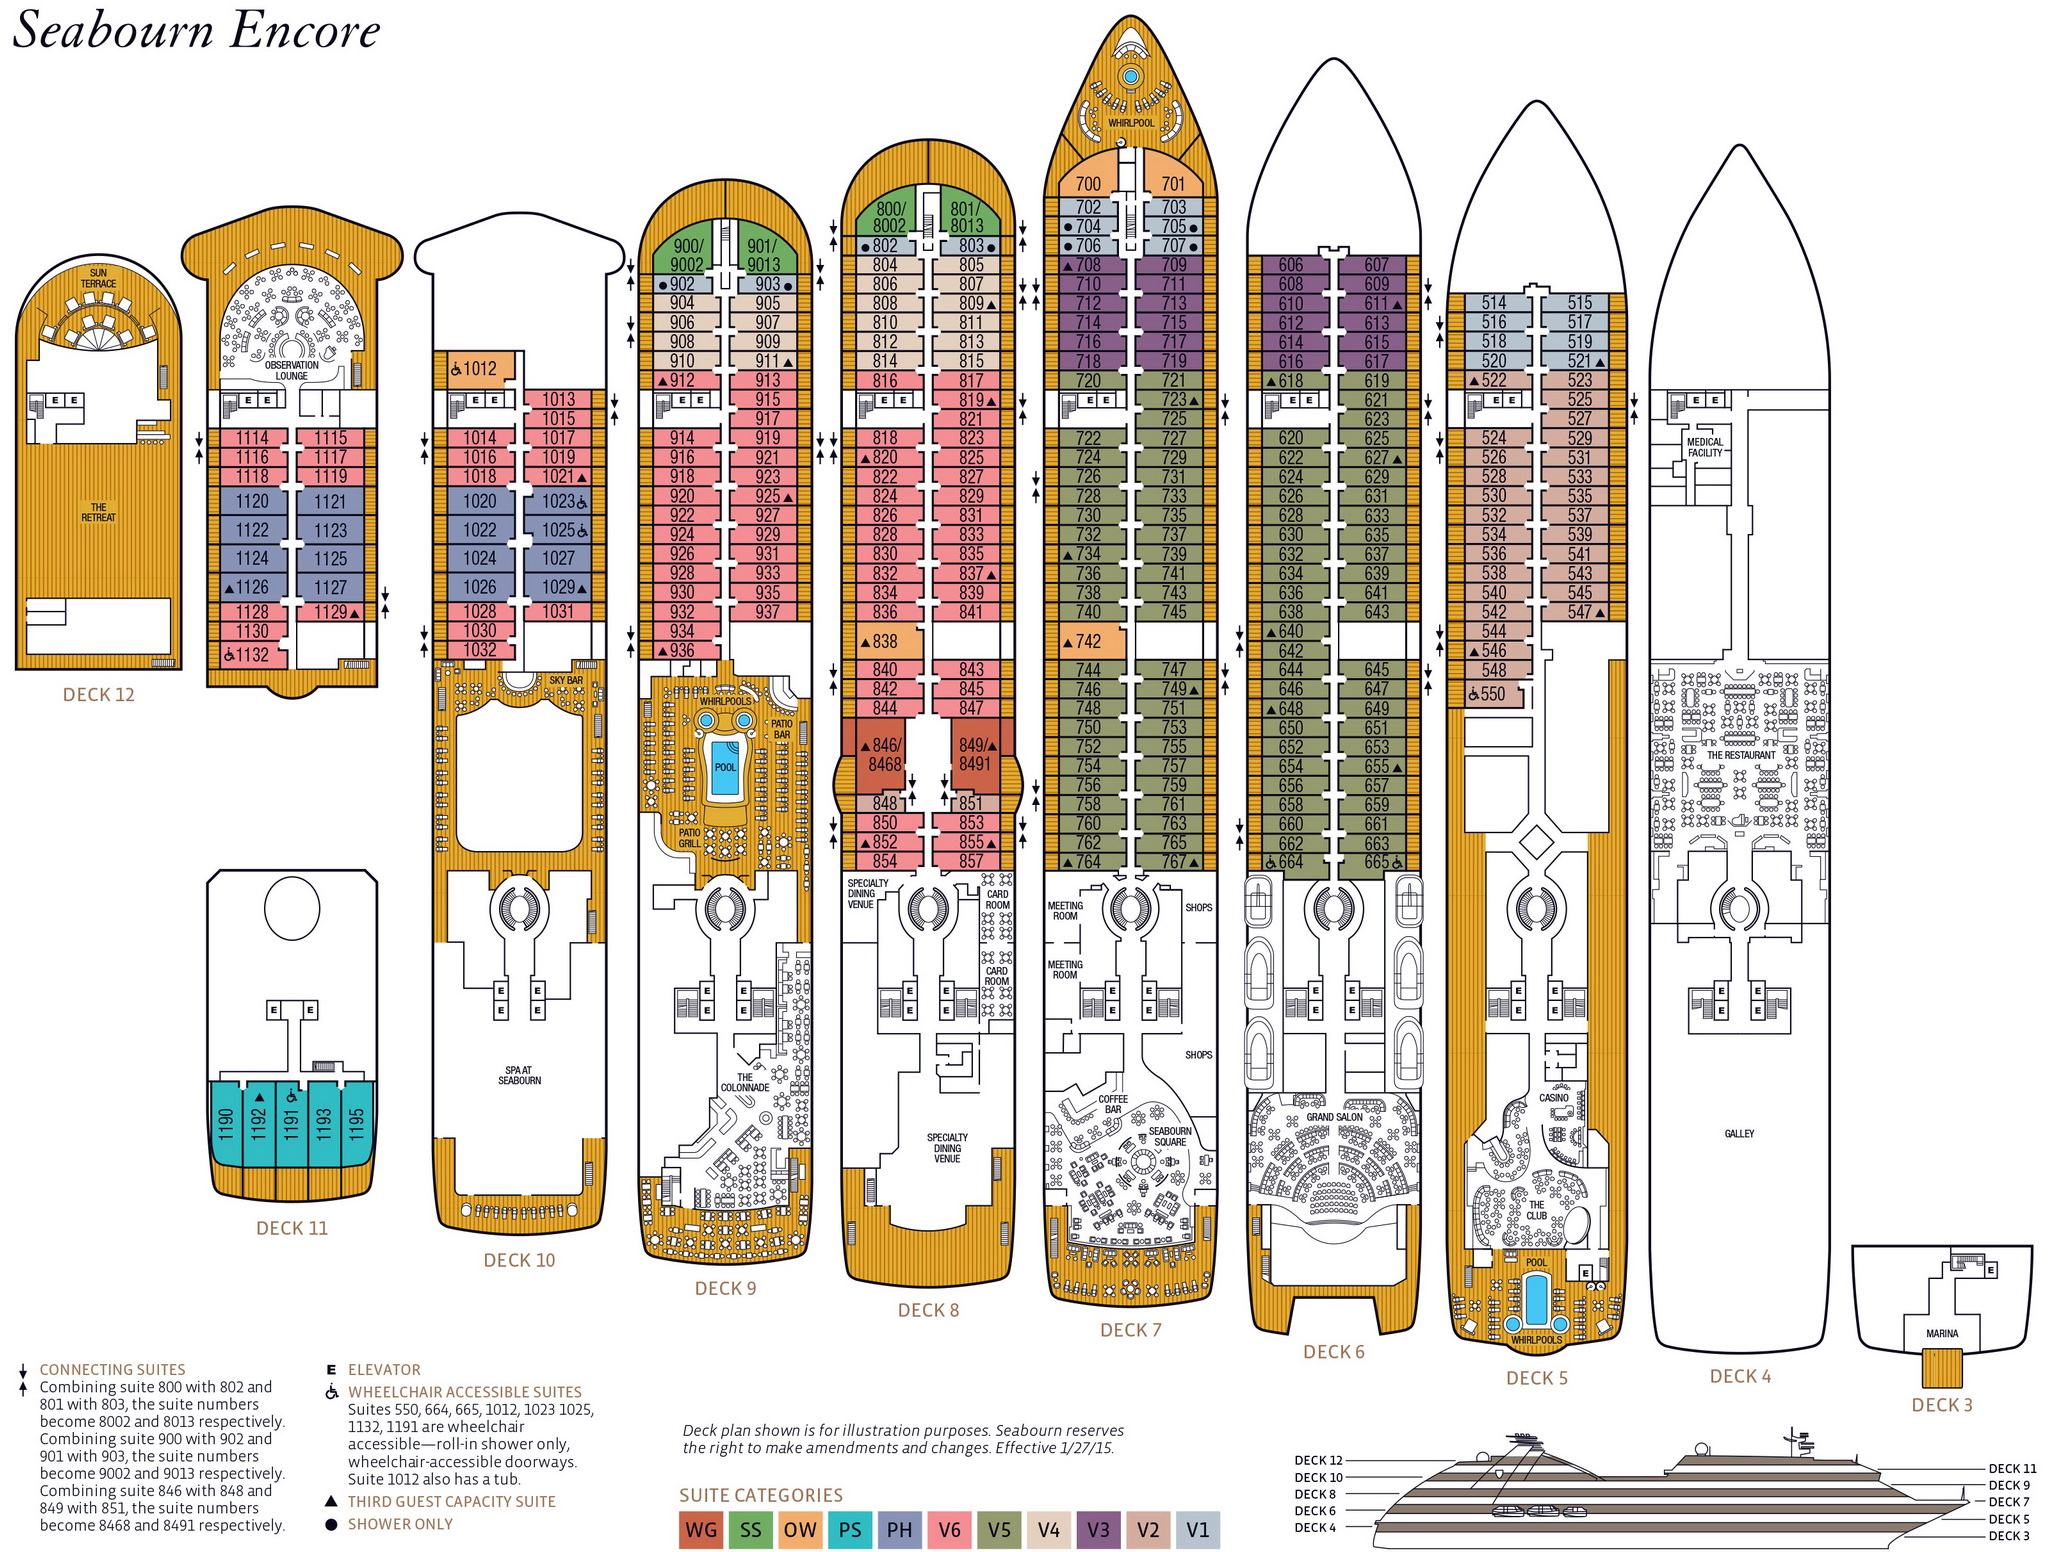 https://i.ibb.co/mX3QTkF/Seabourn-Encore-deck-plan.jpg